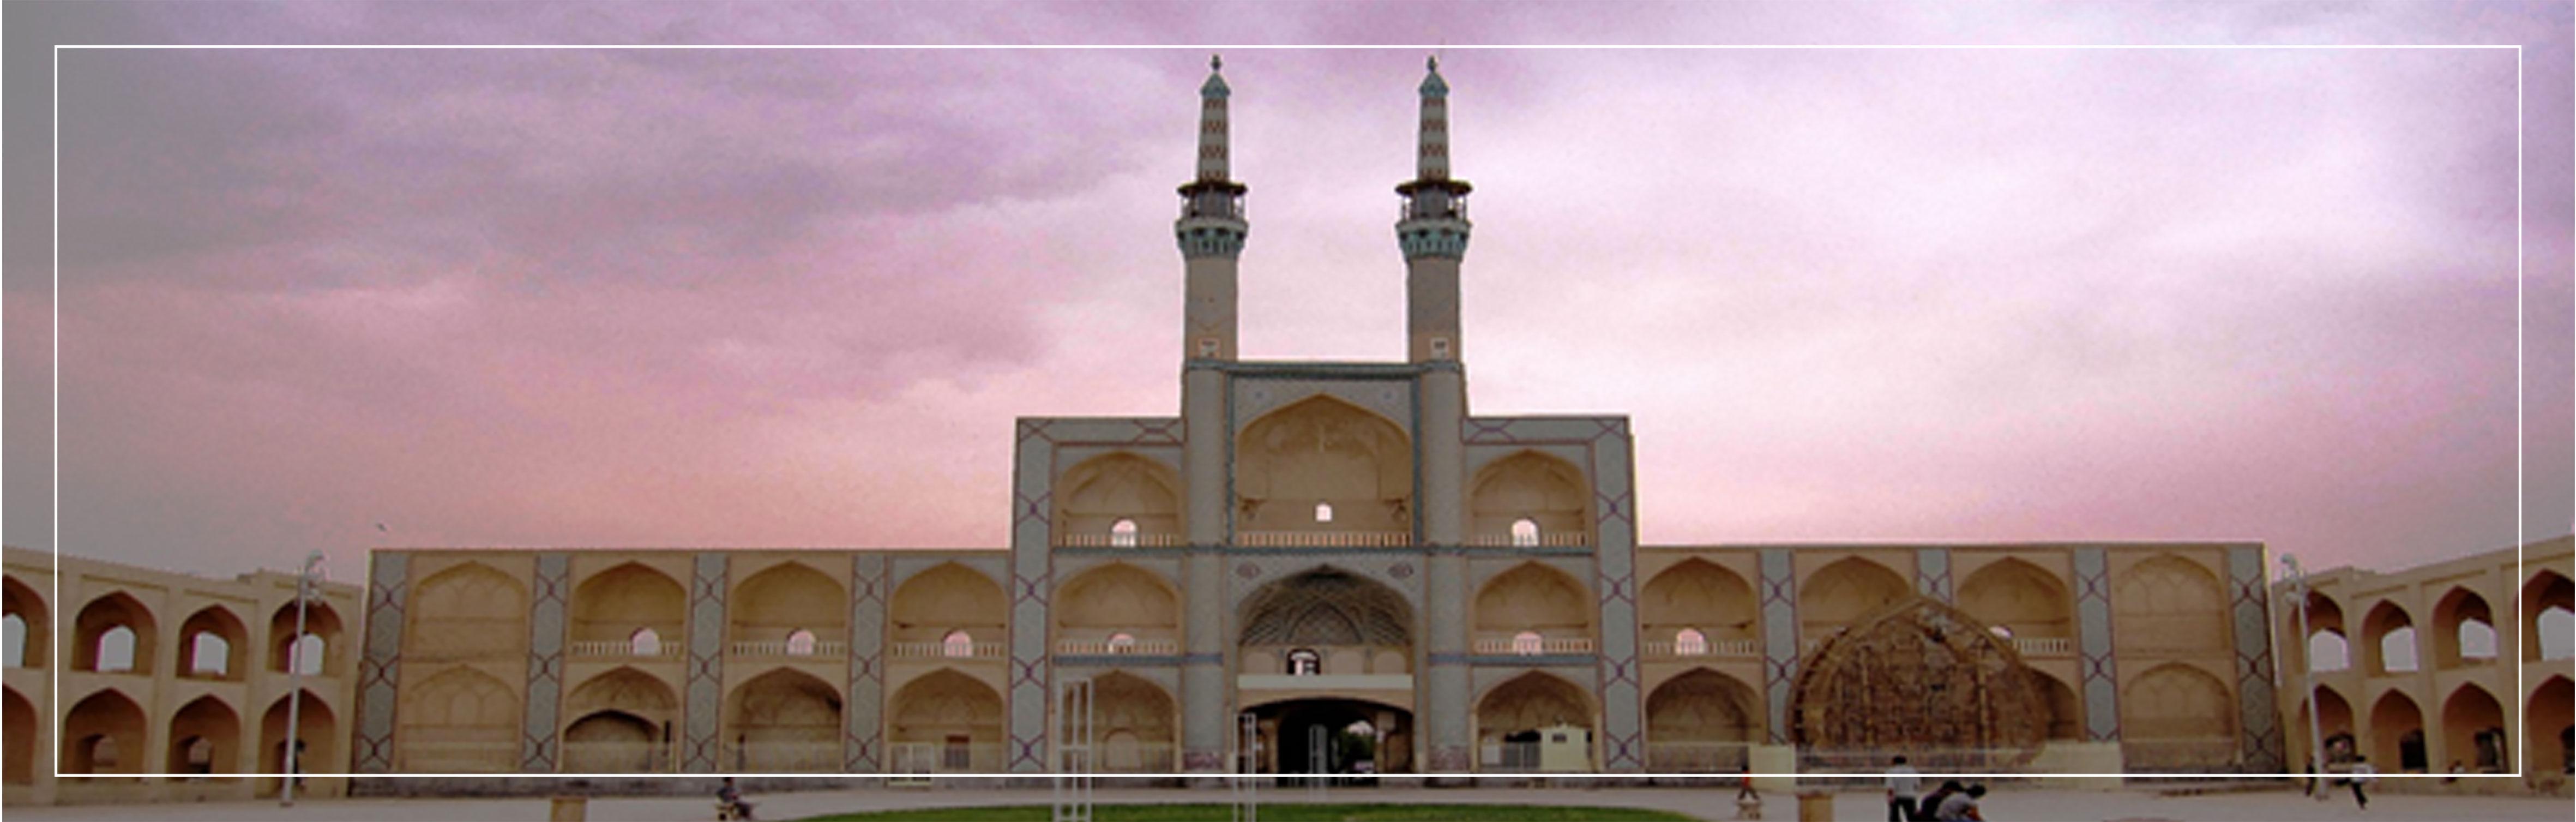 Hidden-Treasures-of-Persia-Tour